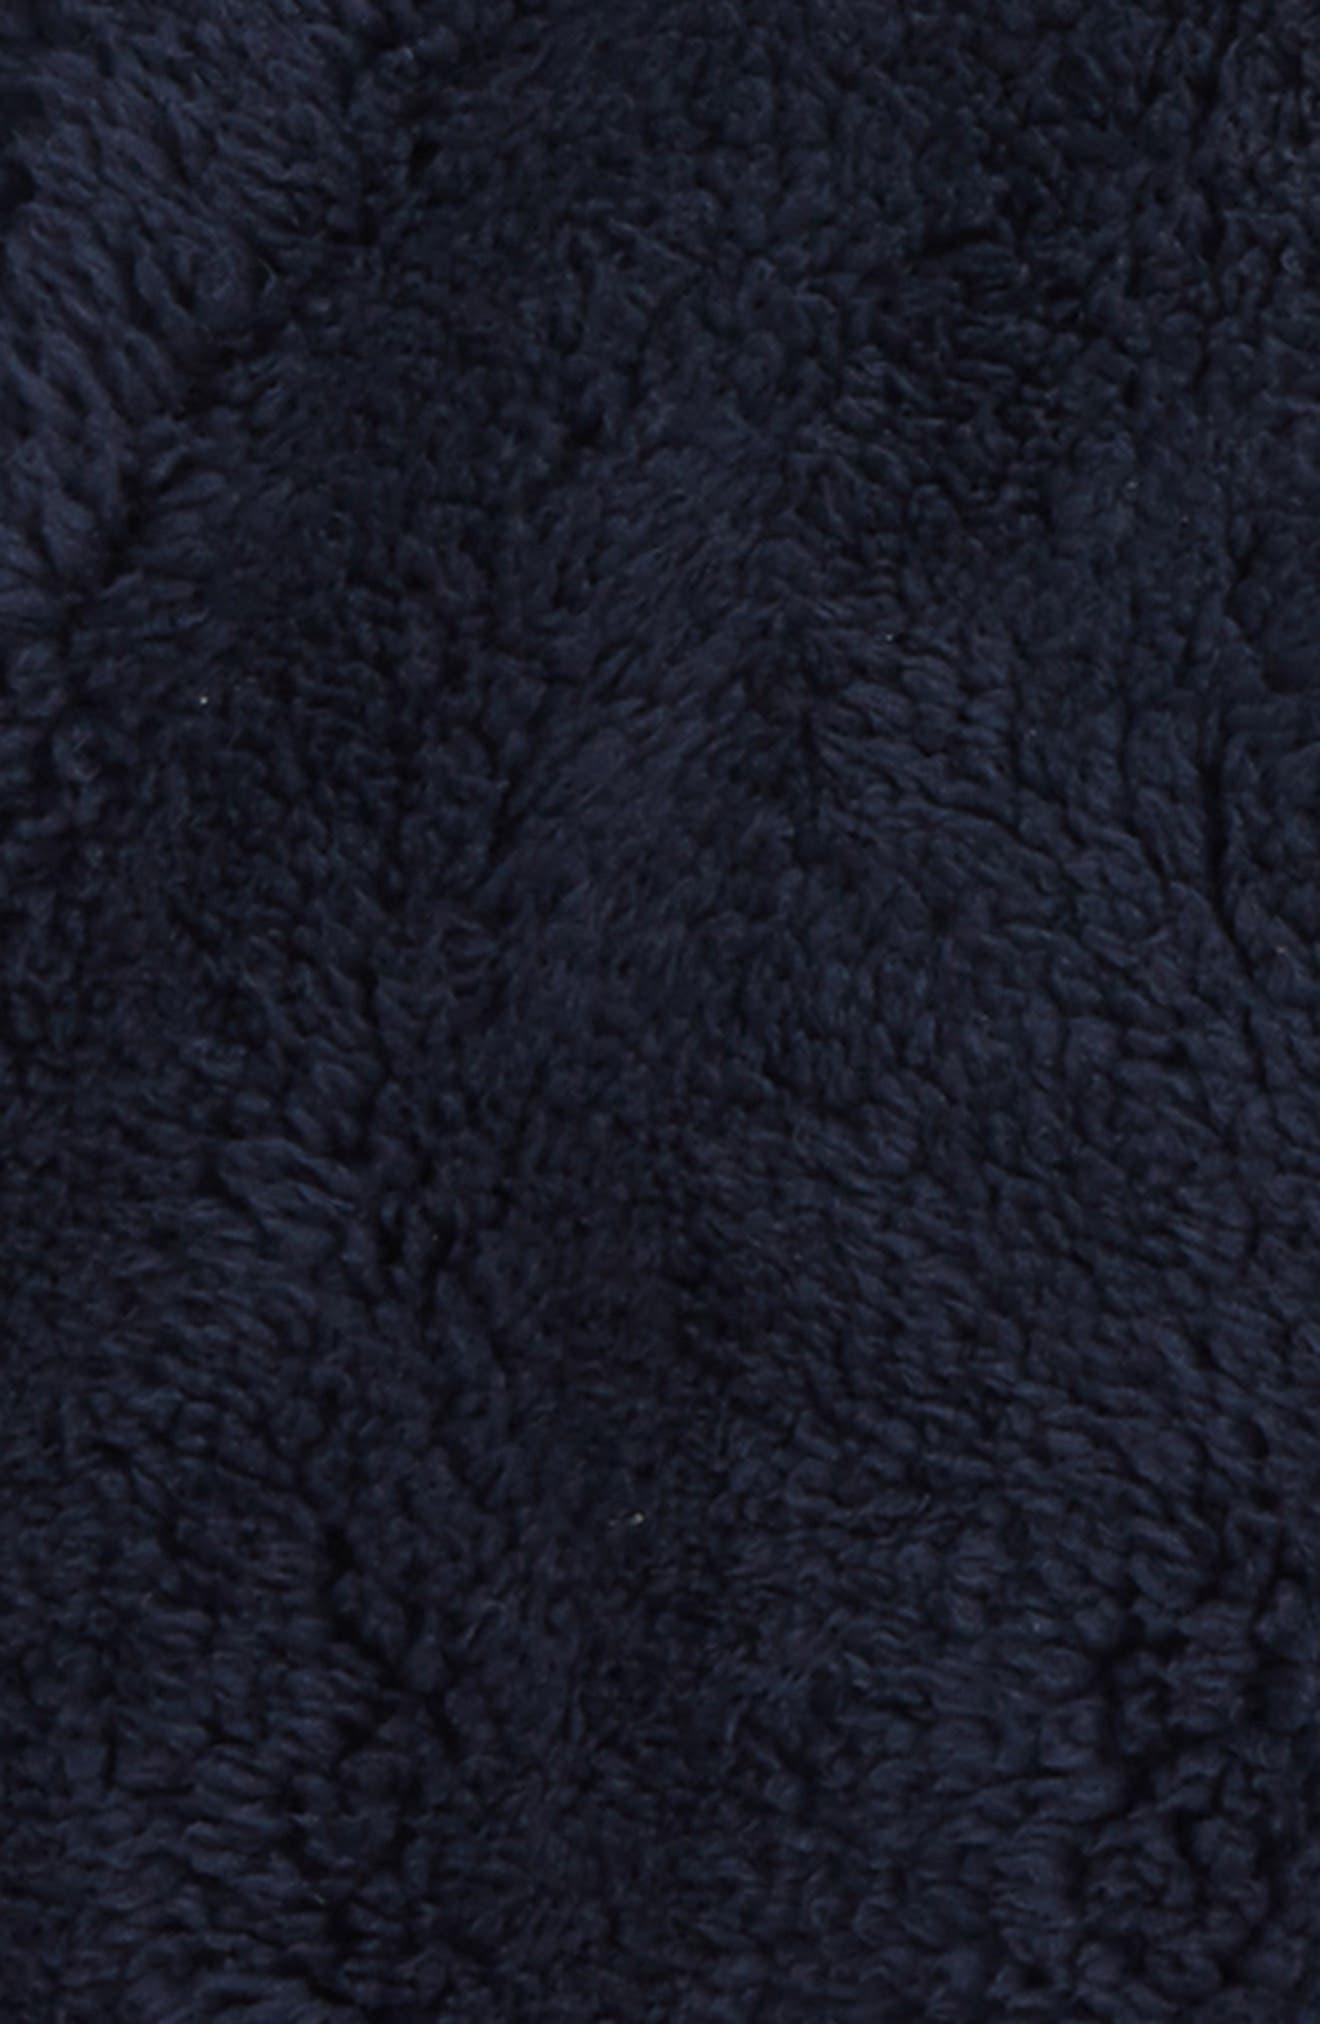 Reversible Quarter Zip Sweatshirt,                             Alternate thumbnail 3, color,                             404